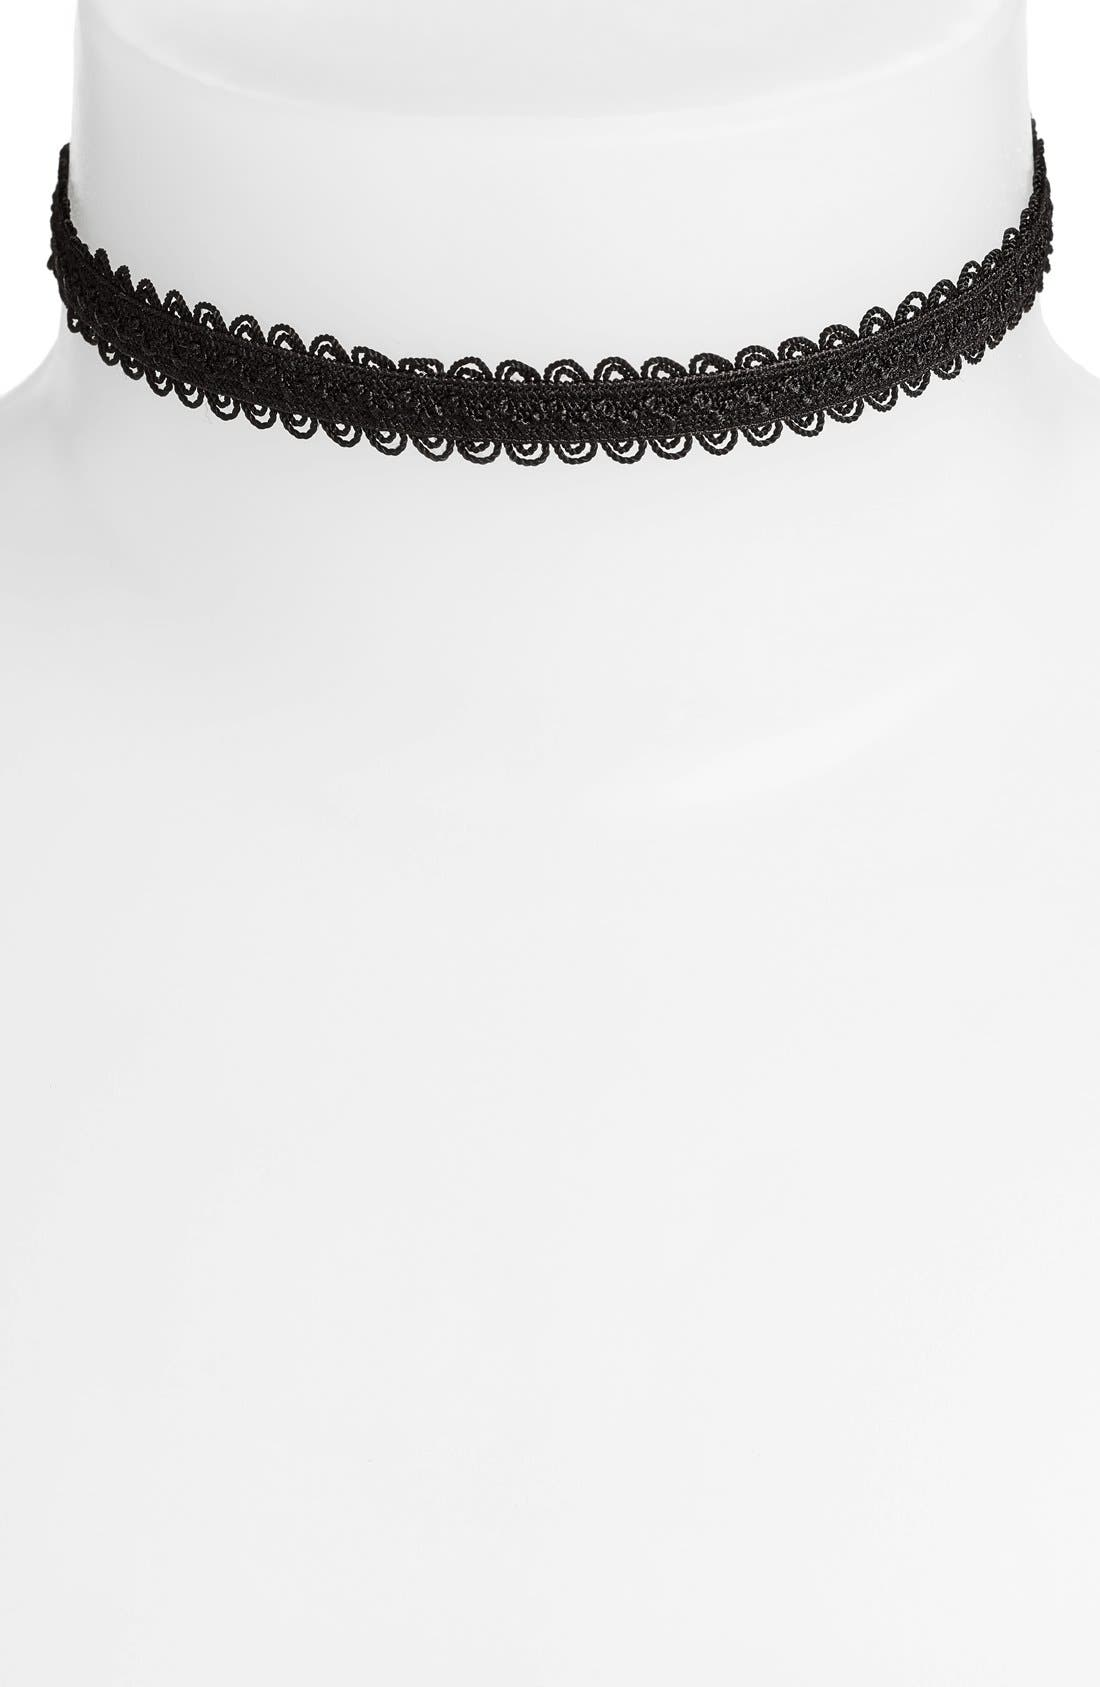 Alternate Image 1 Selected - Vanessa Mooney Black Lace Choker